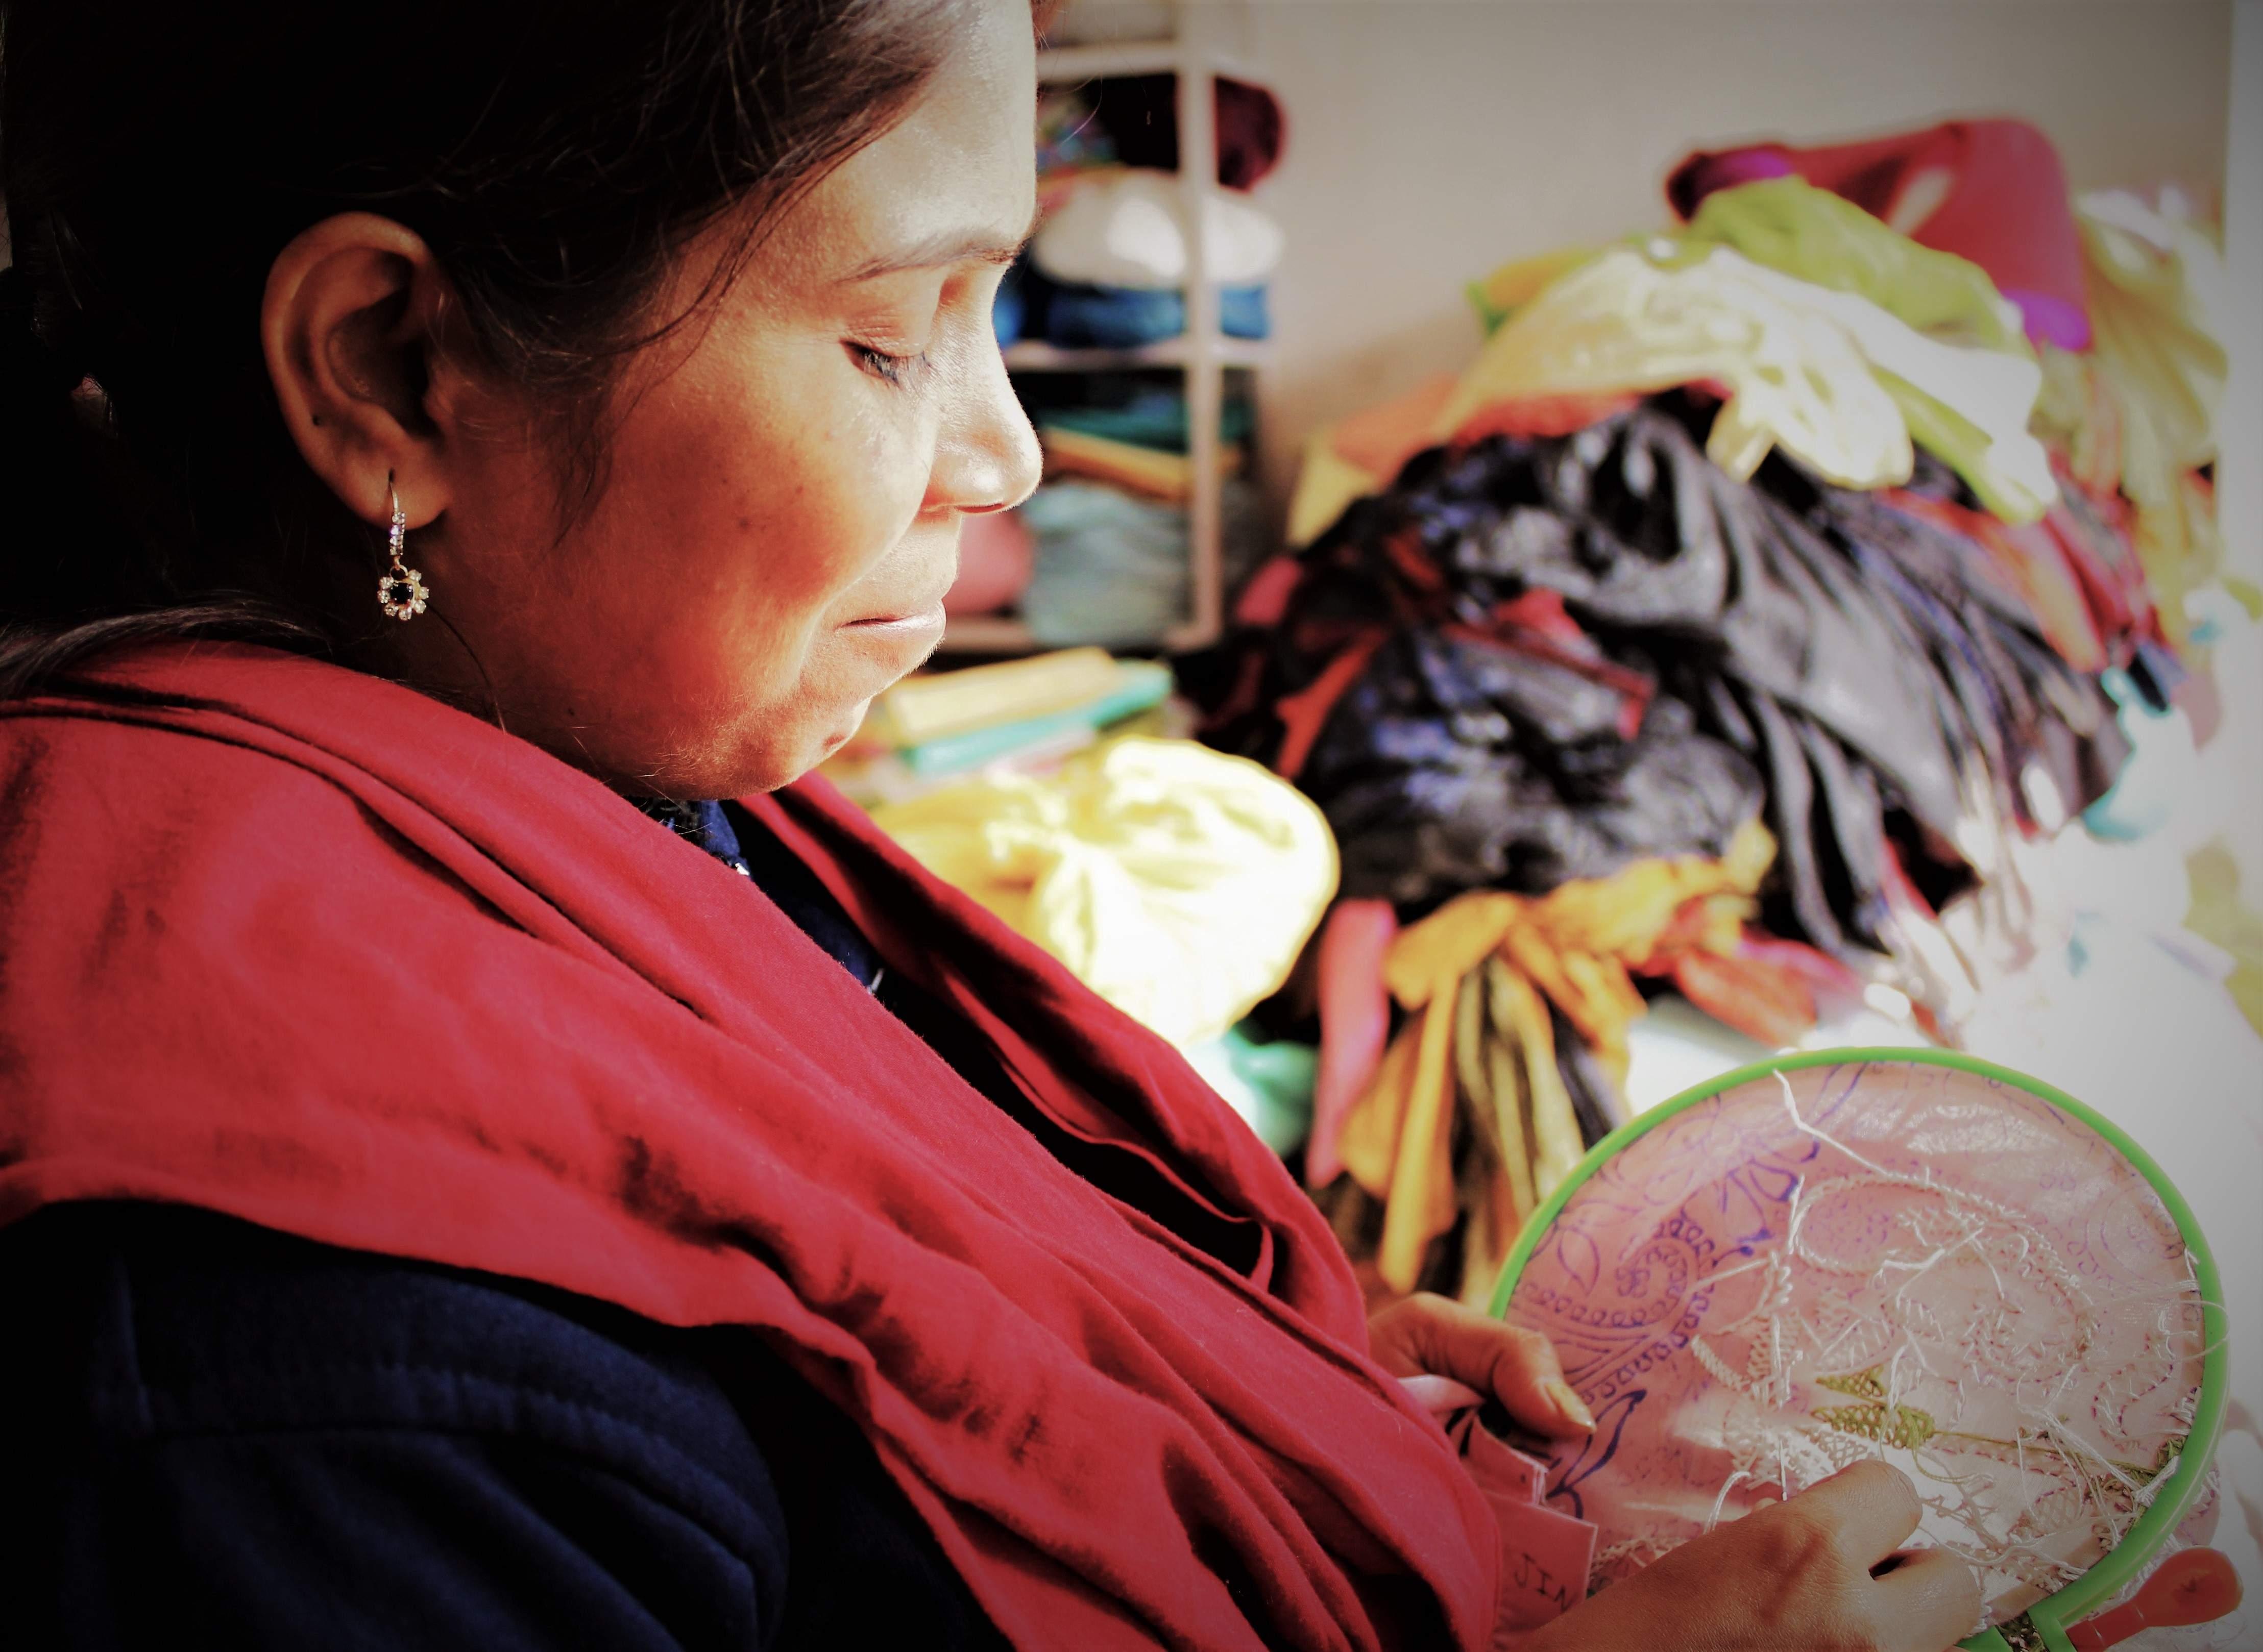 Chikankari - The Traditional Embroidery Work